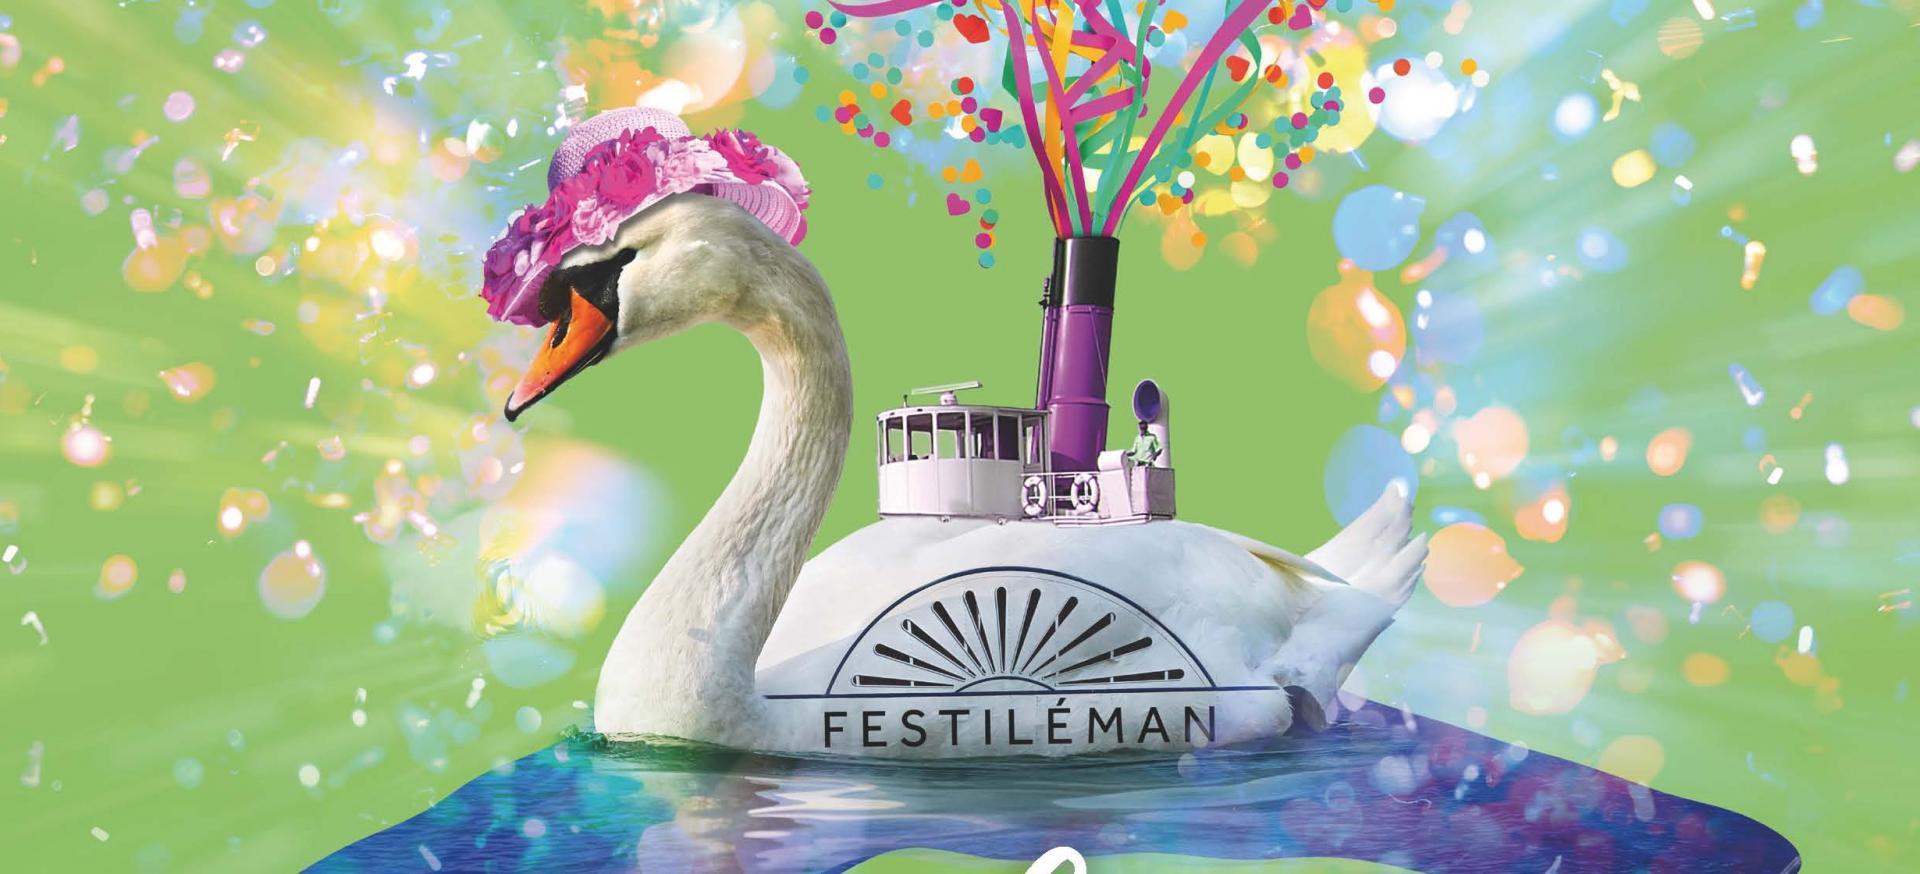 Evian festileman2018 bandeau